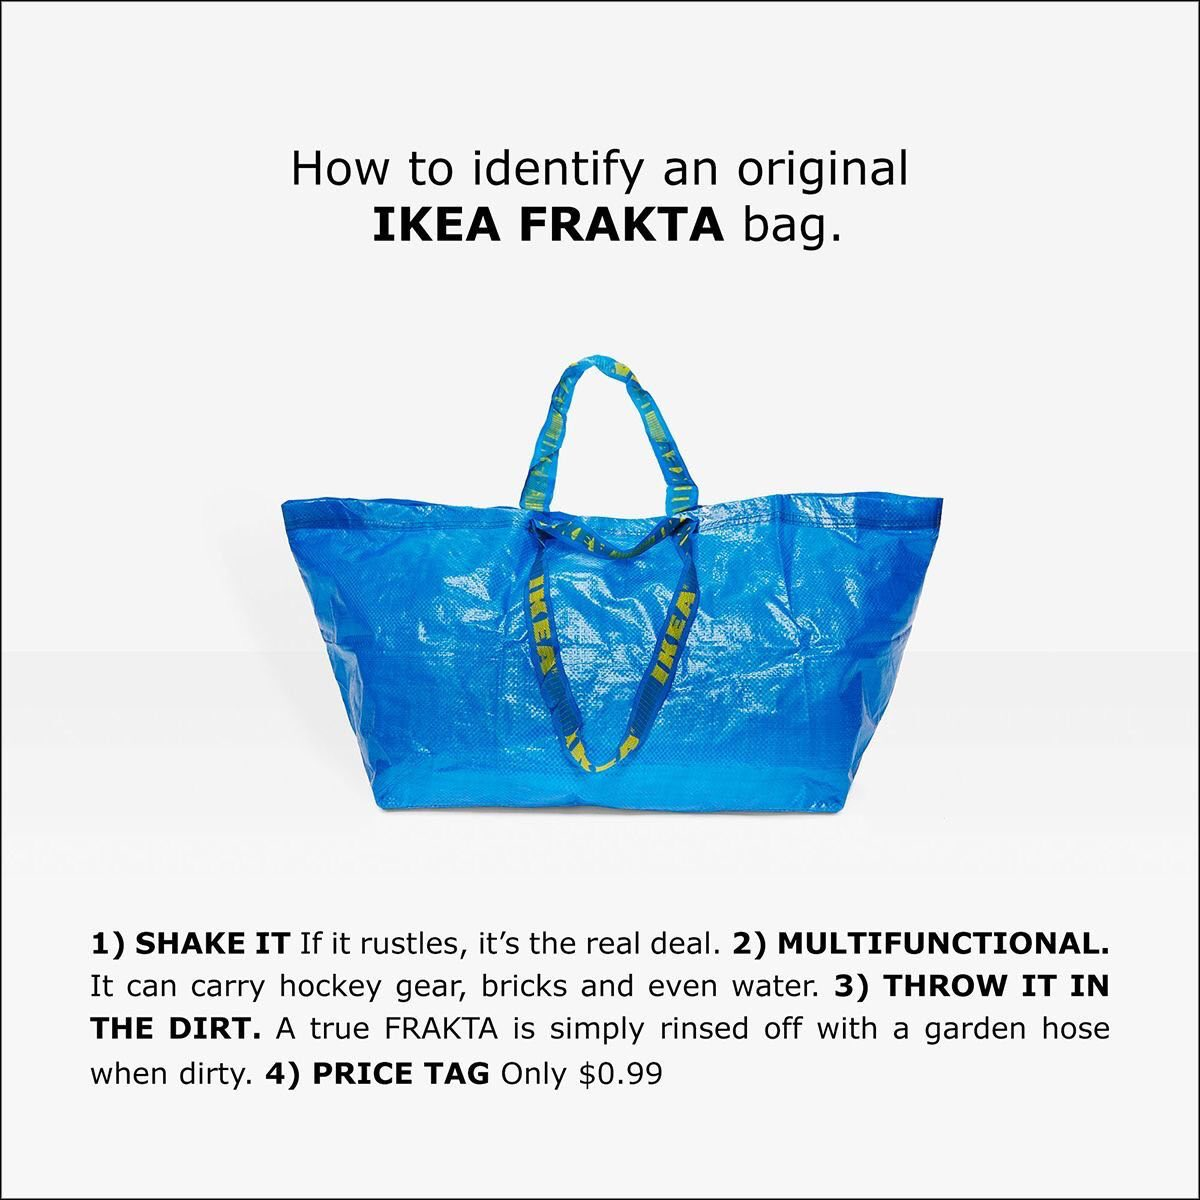 Original Ikea Frakta Bag reklamlar